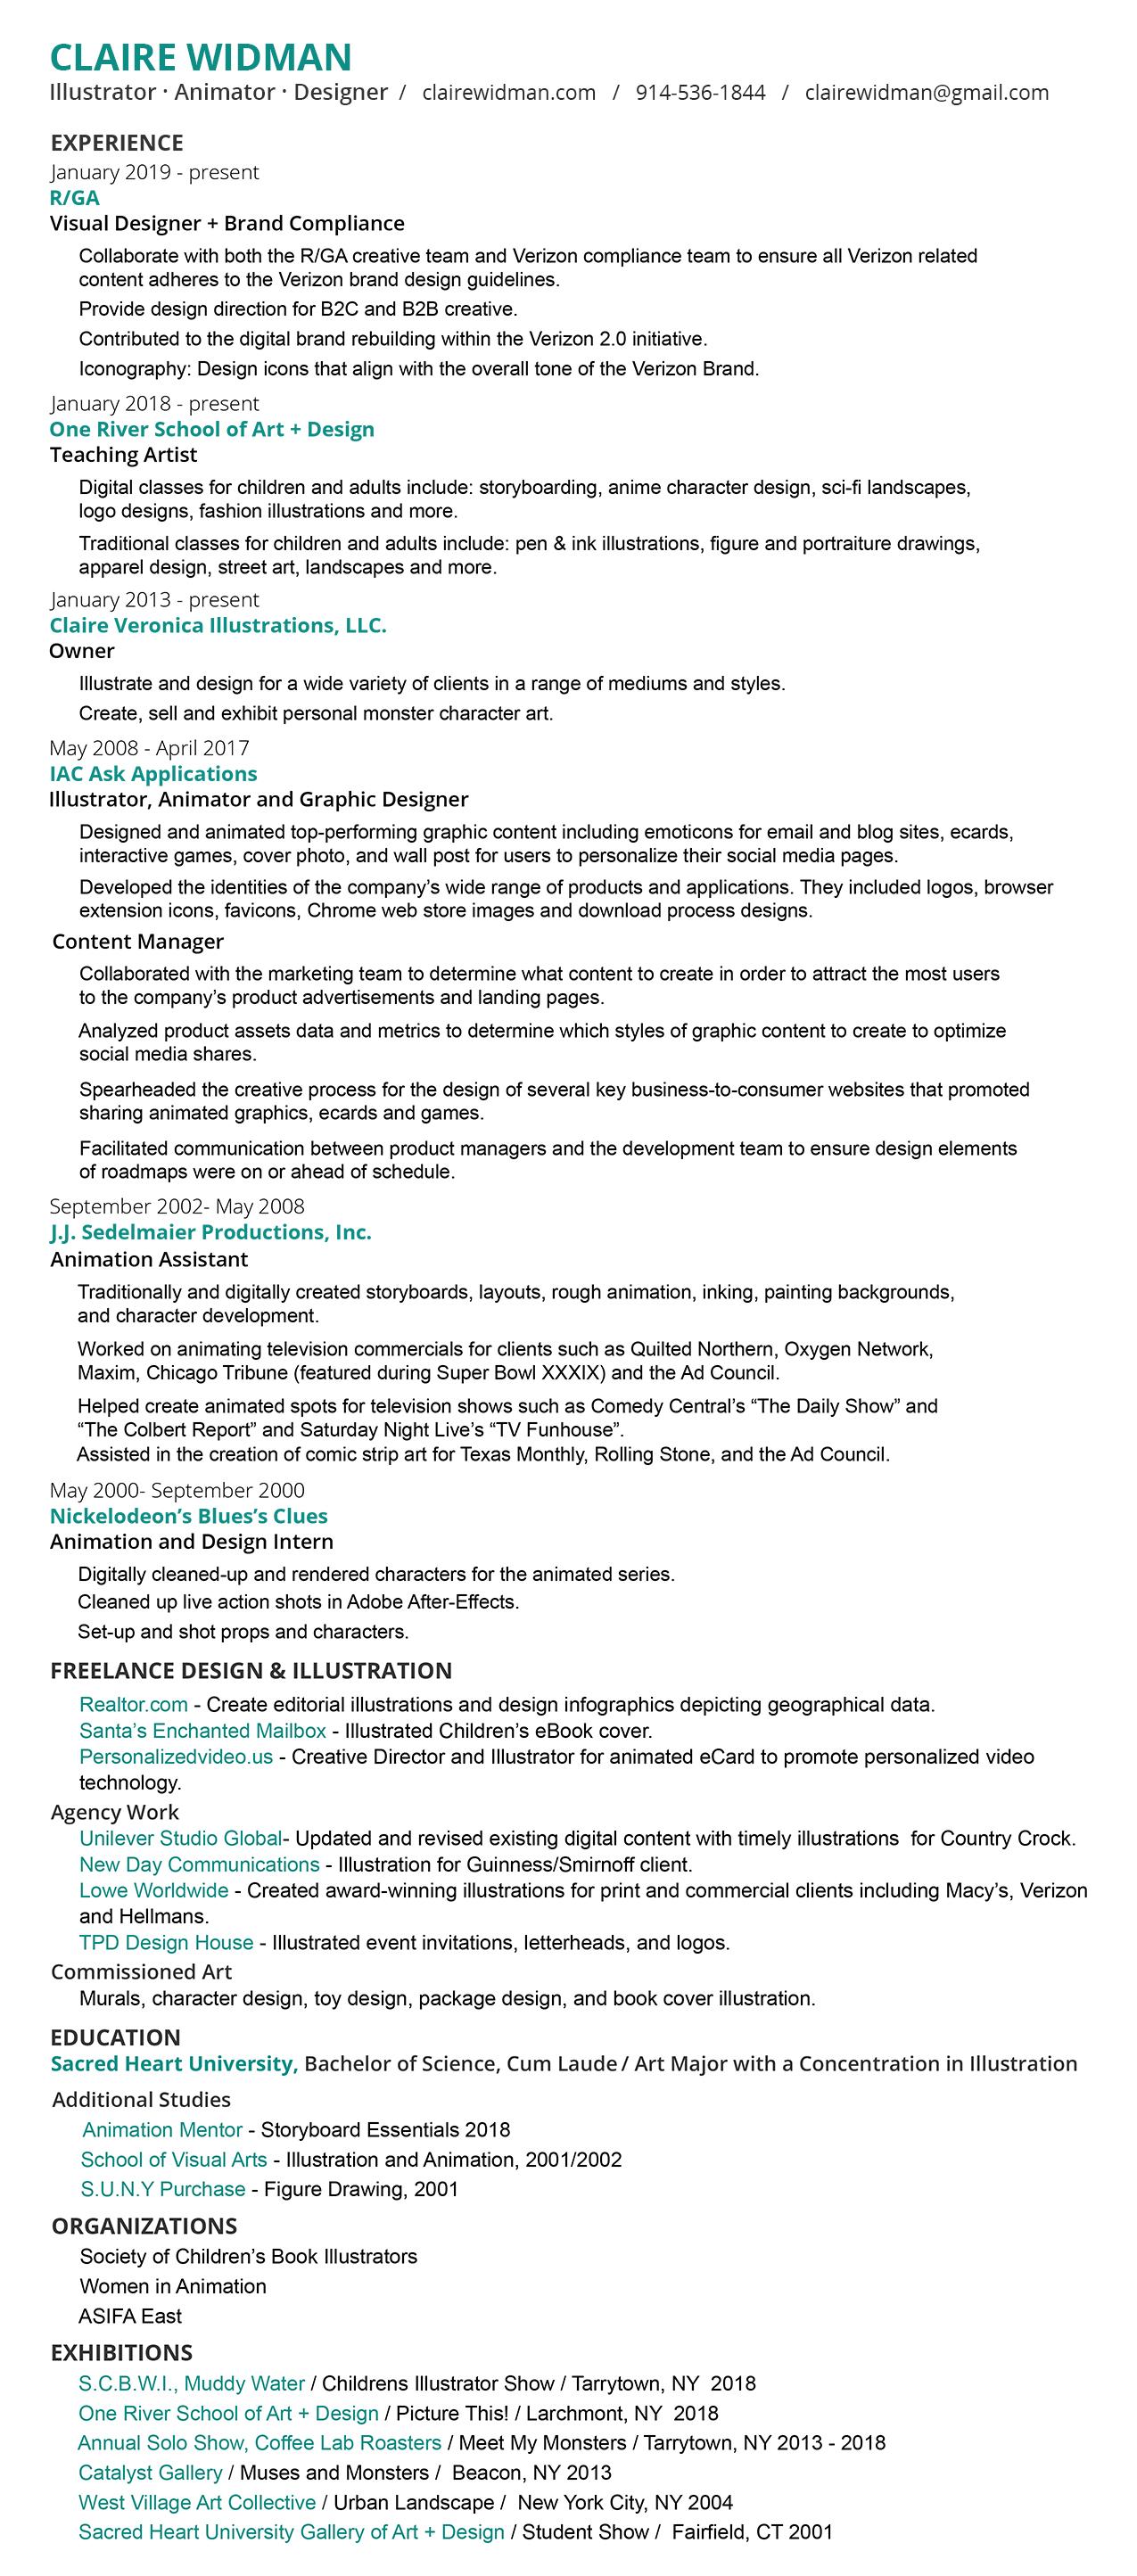 Resume_06-2019_latest.jpg